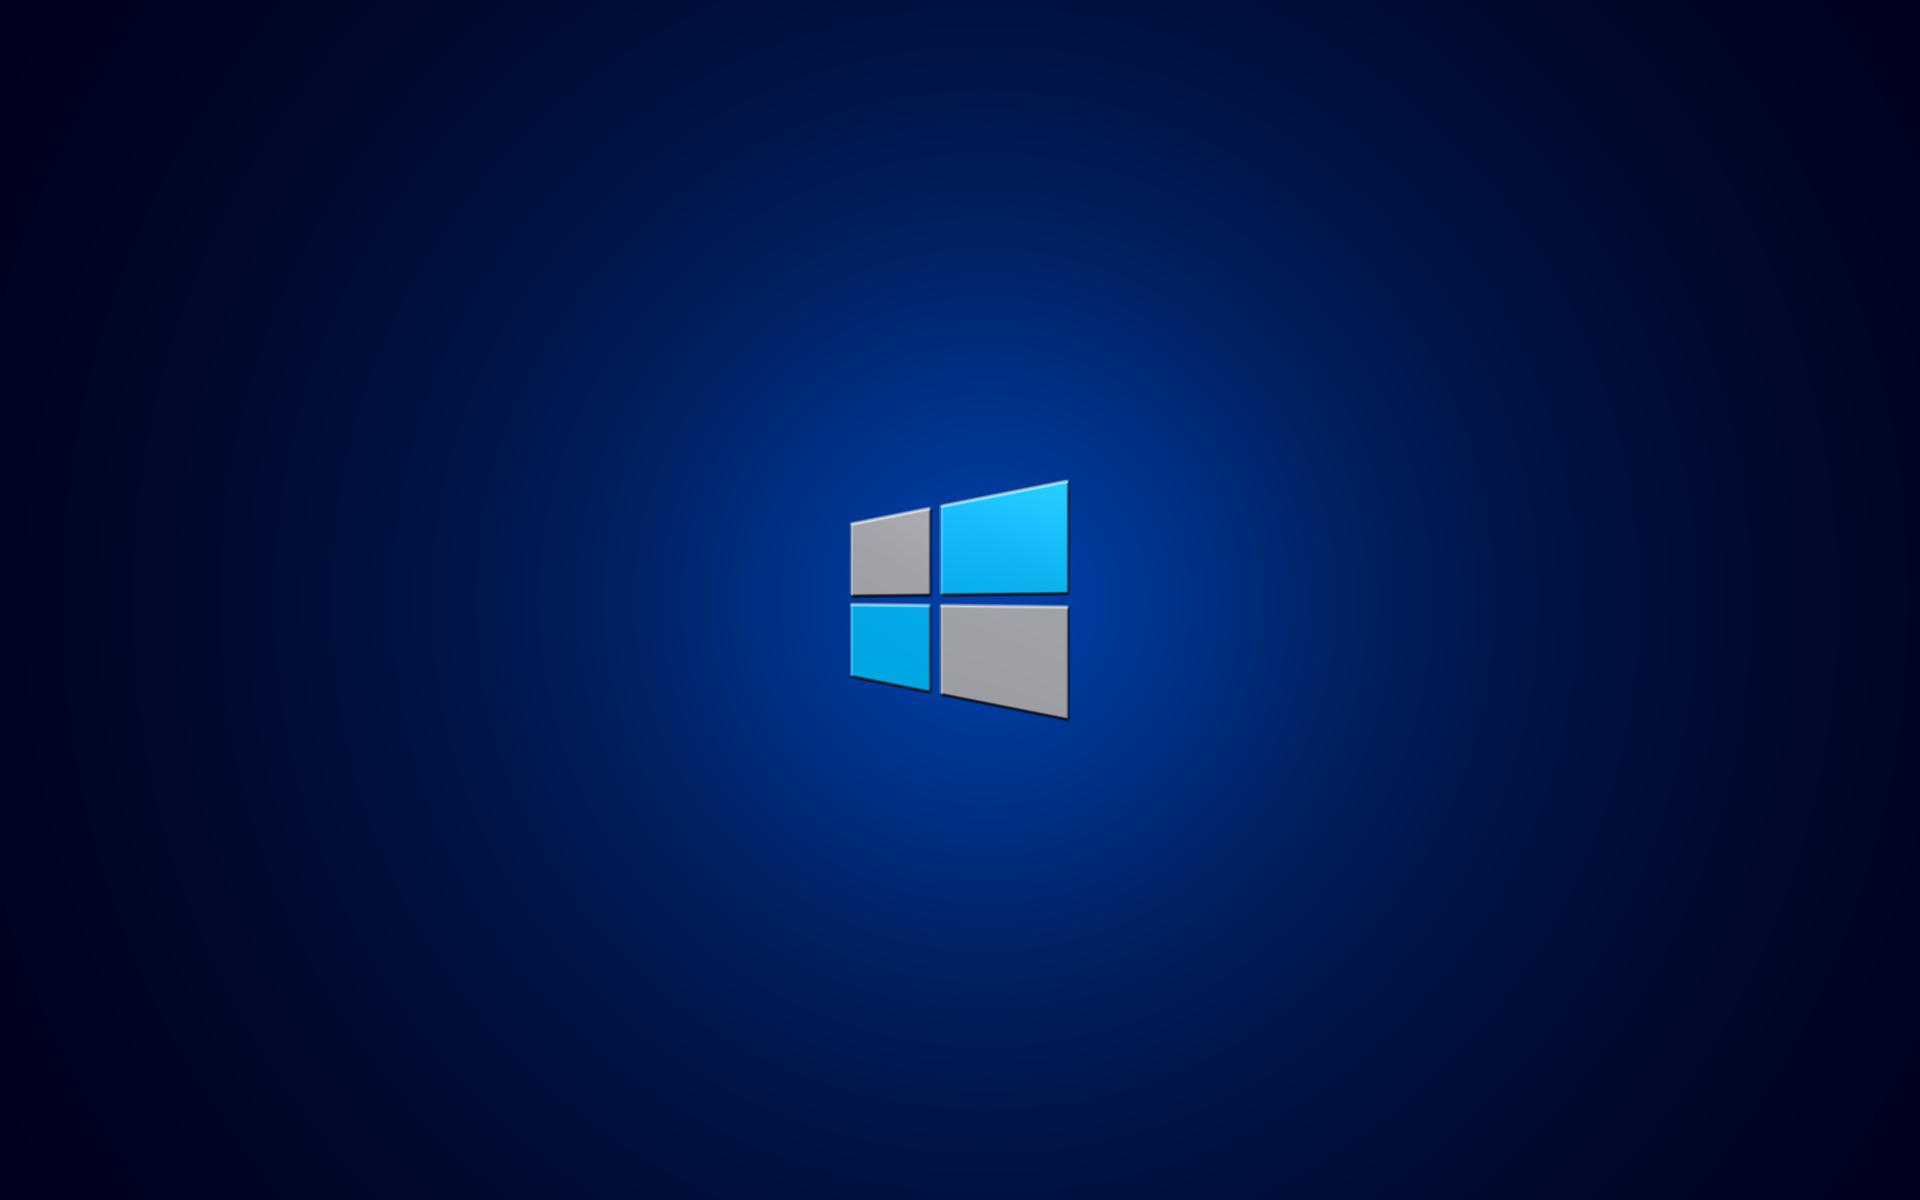 Download Wallpapers Windows 7 4k Se7en Blue Background: 4k Windows 10 Wallpapers High Quality